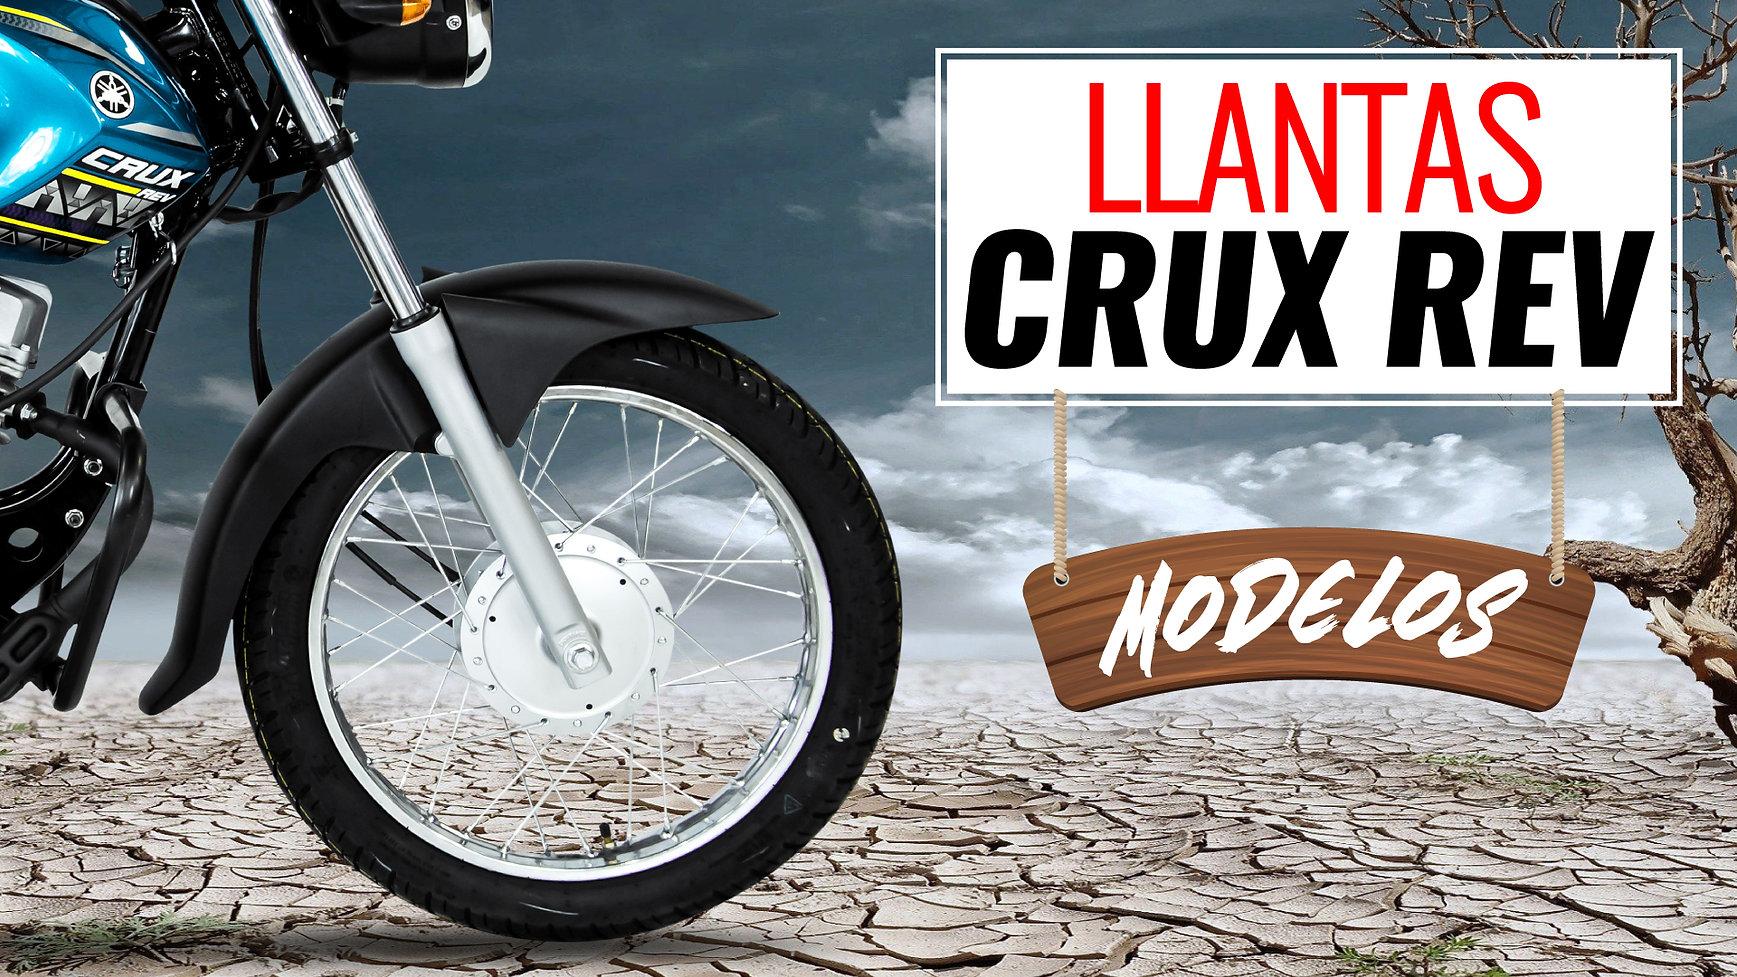 CRUX-REV-LLANTAS.jpg